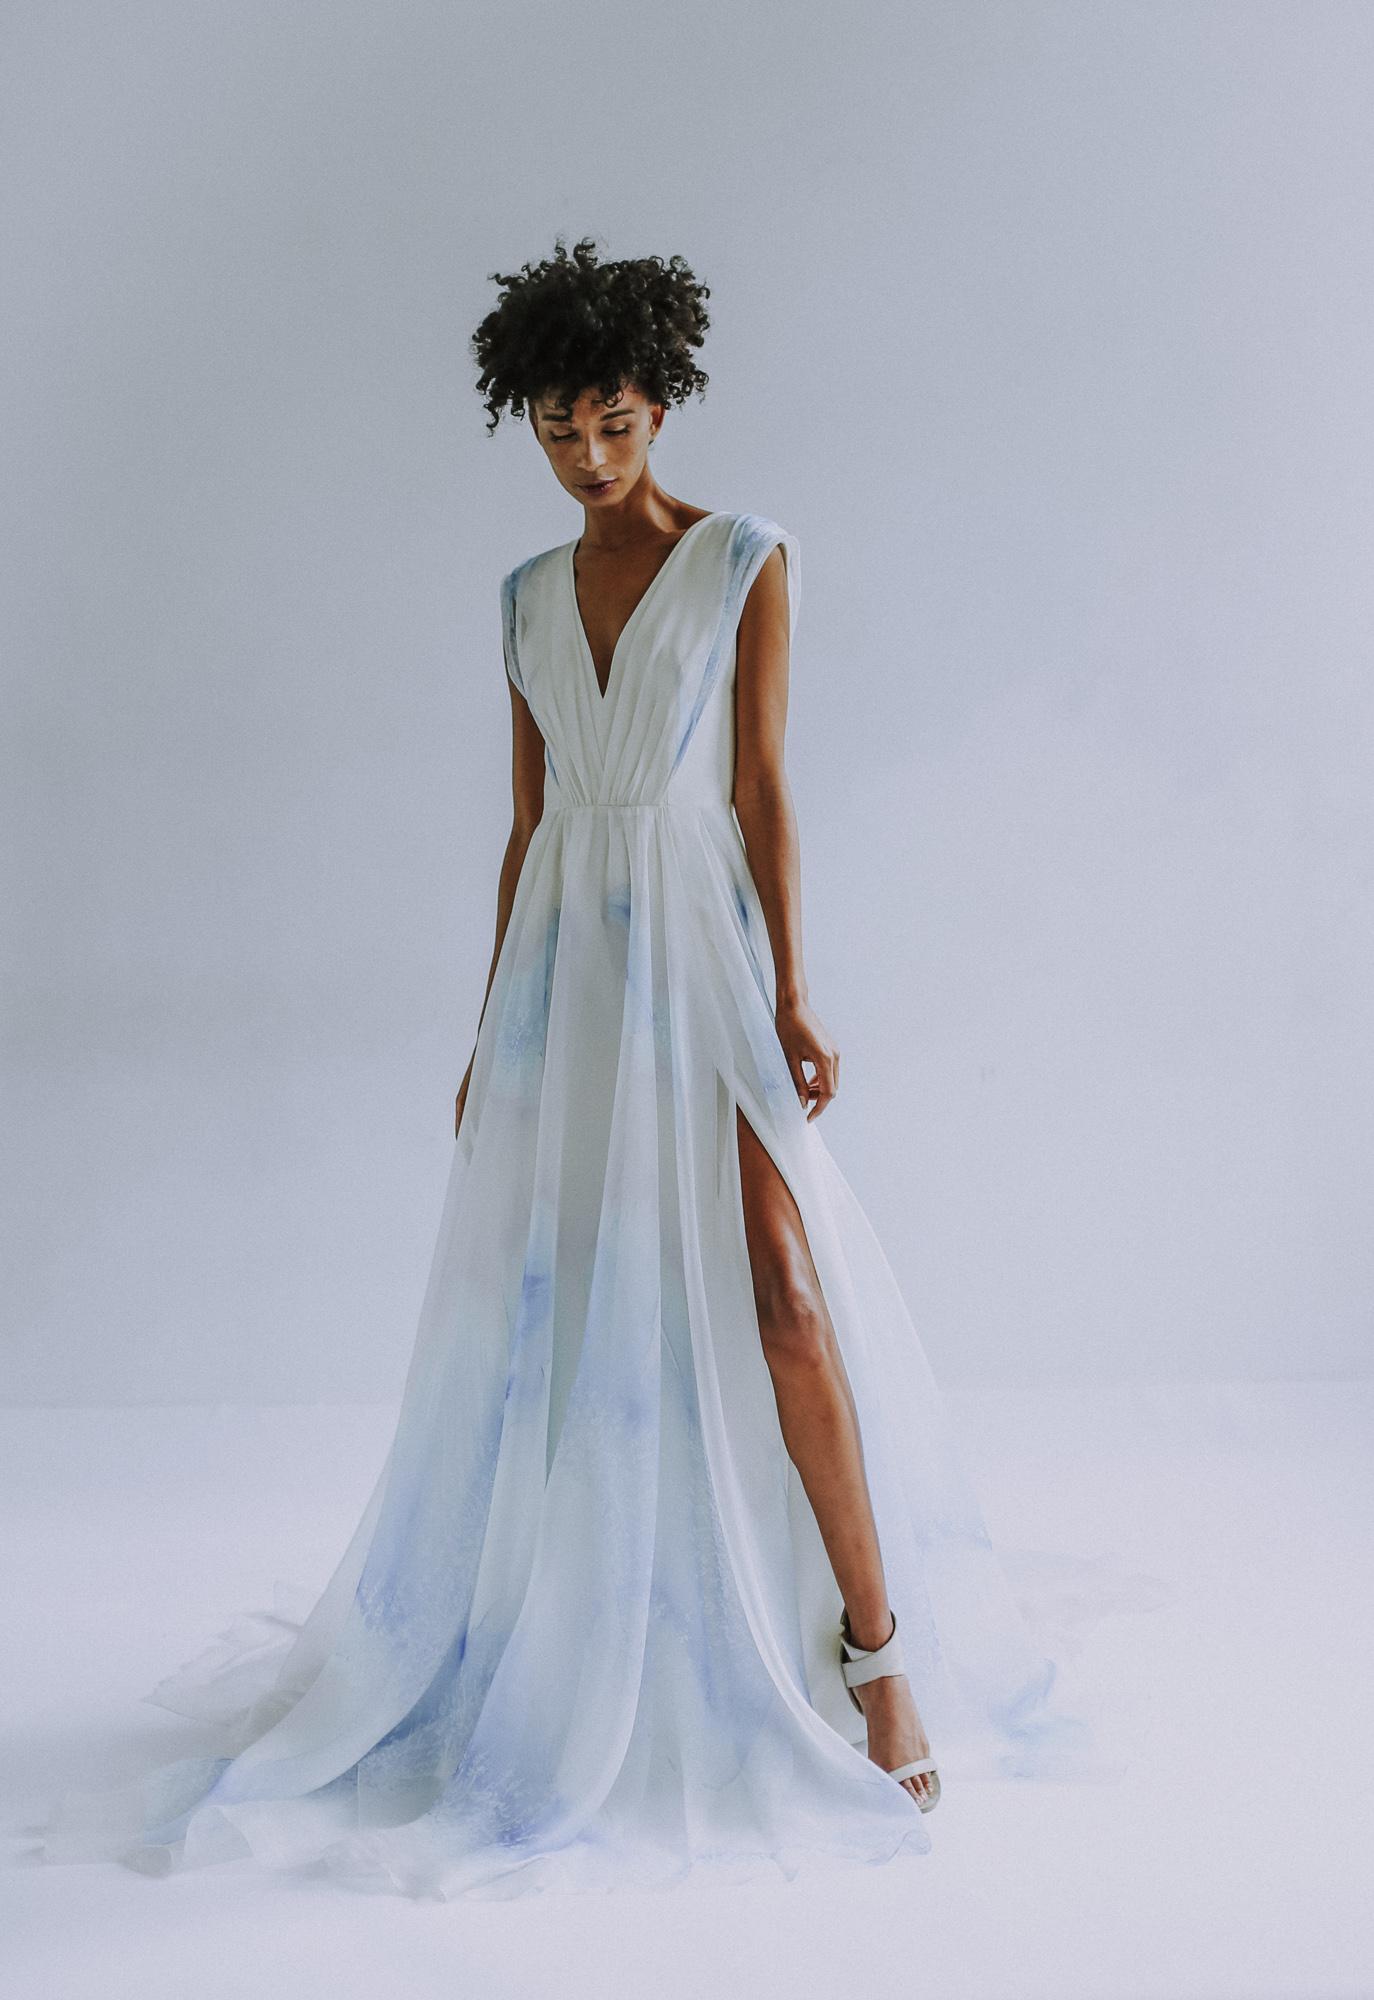 leanne-marshall-wedding-gown-13.jpg